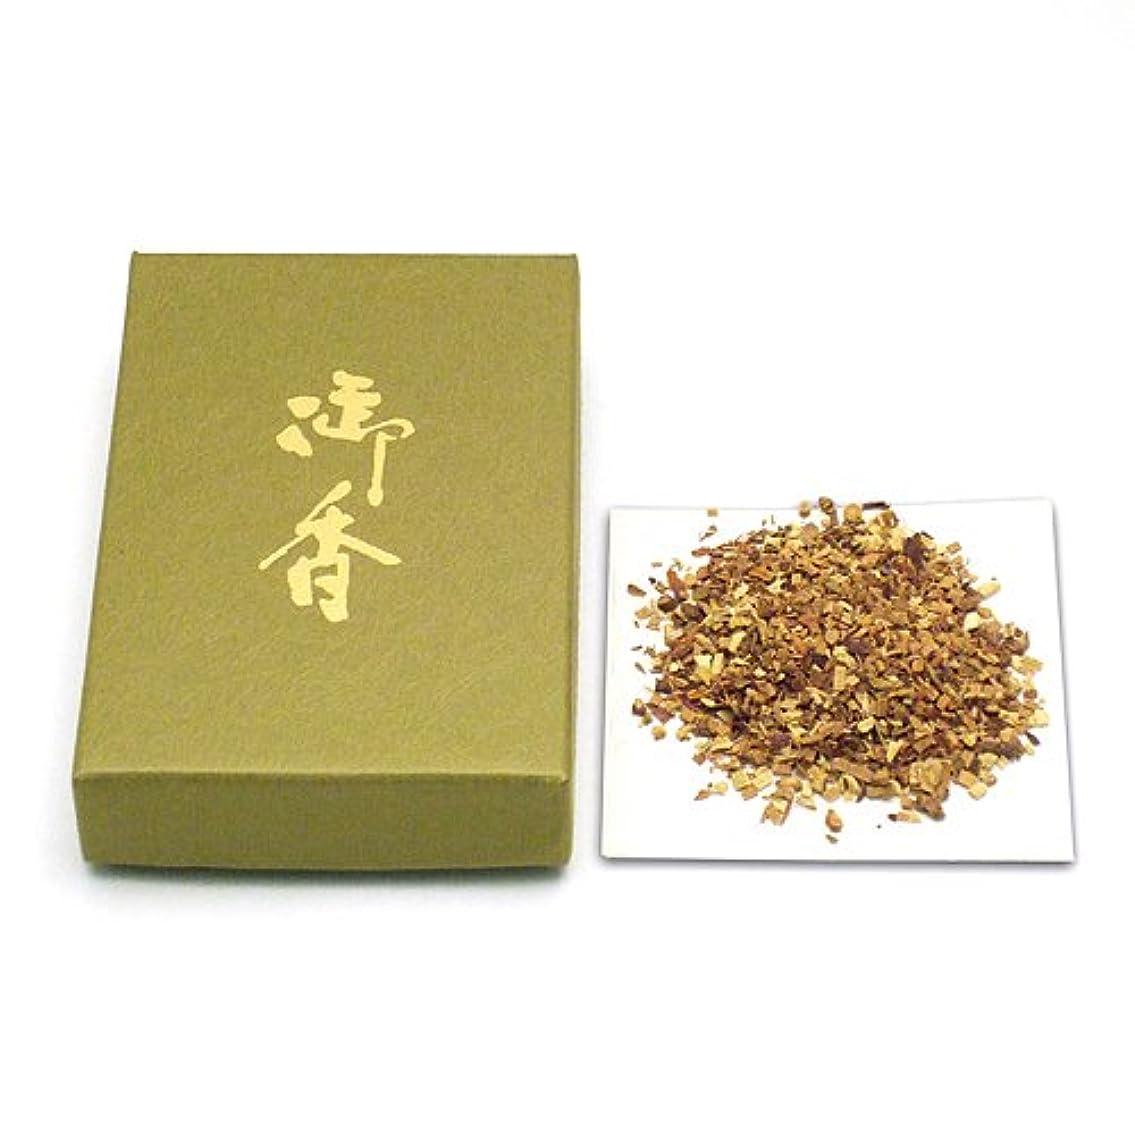 焼香用御香 超徳印 25g◆お焼香用の御香